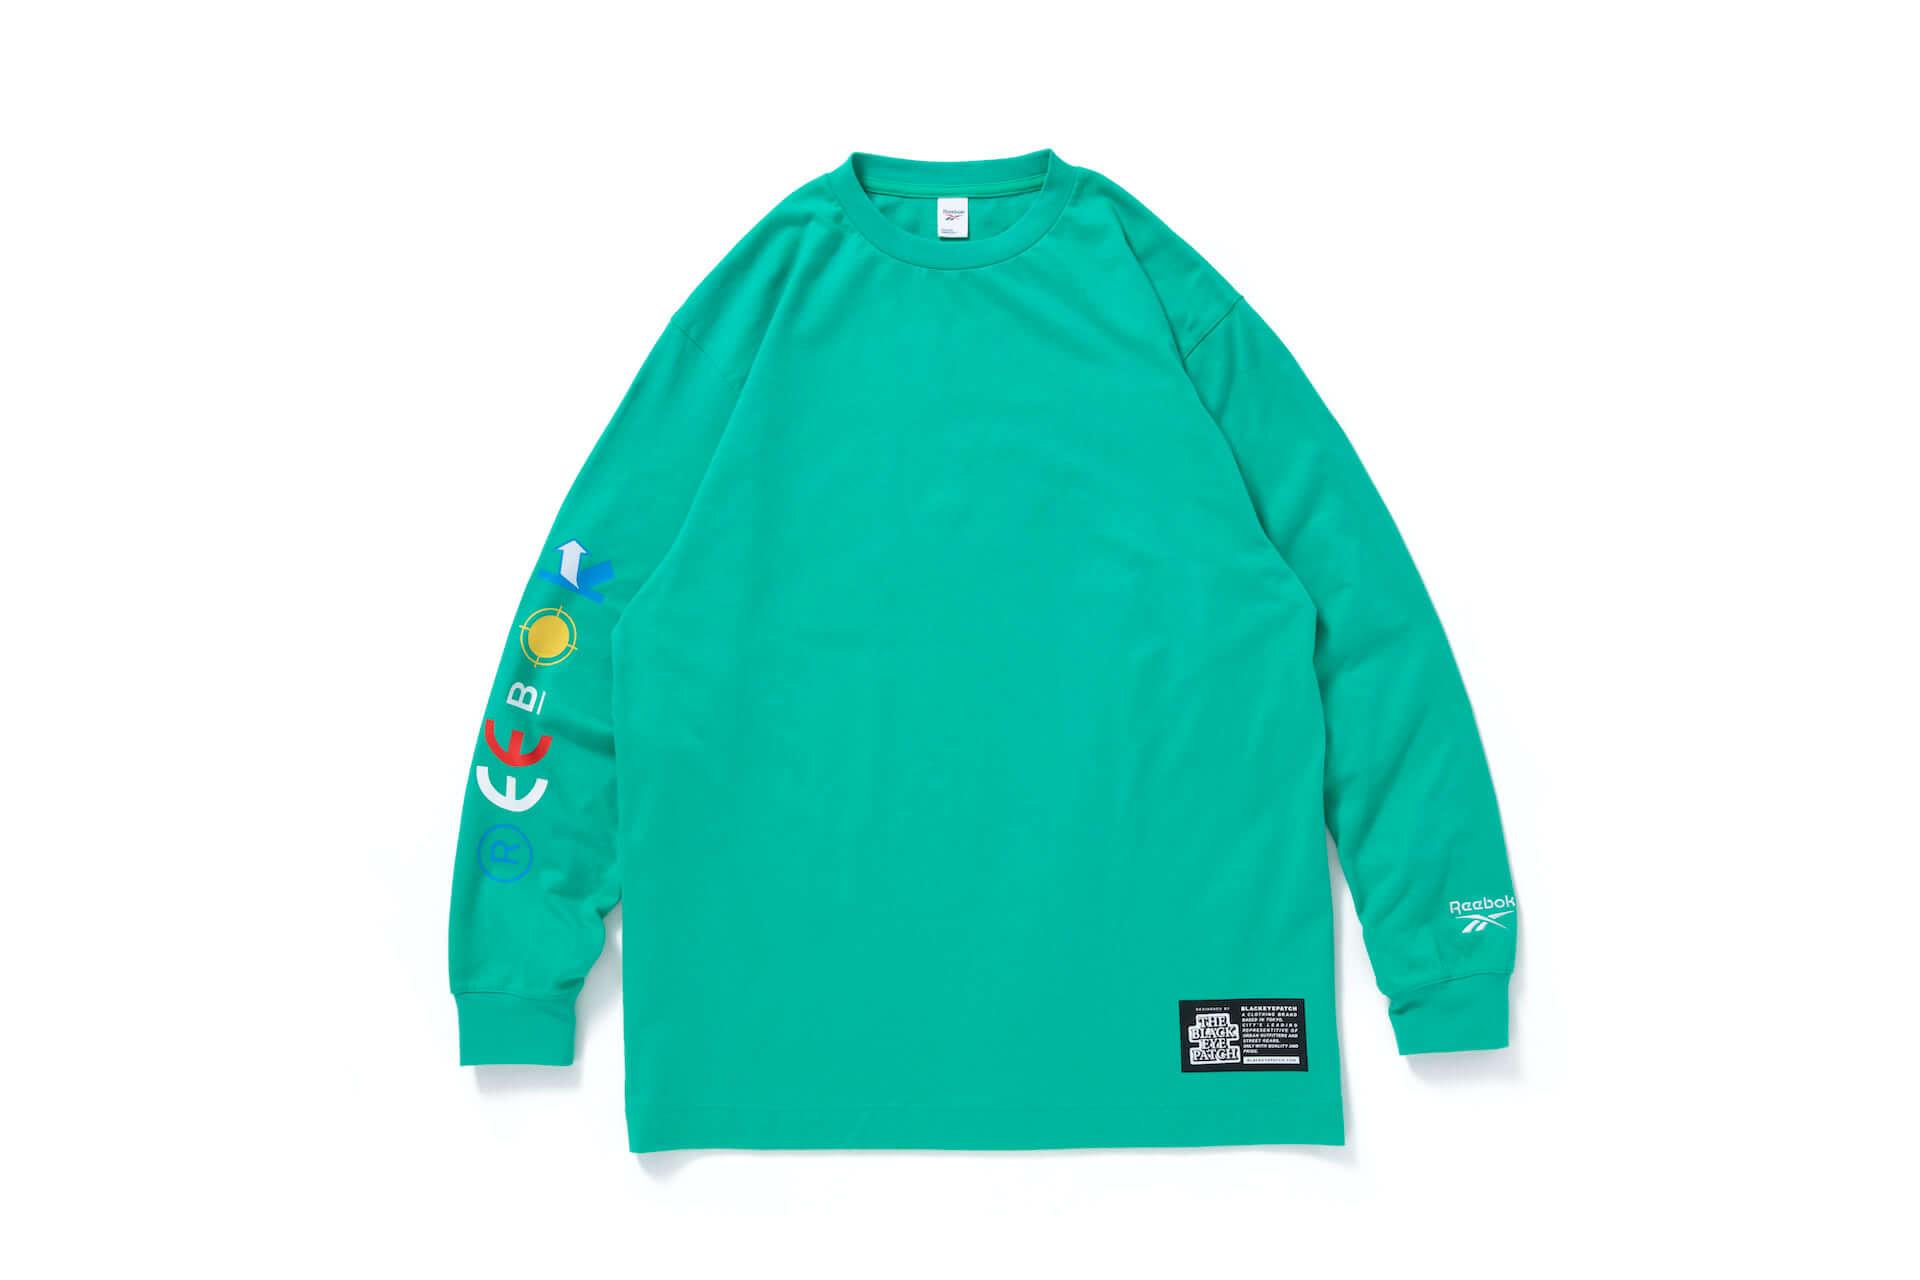 BlackEyePatchがReebokのデザインを再構築!「CLUB C BEP」やTシャツ含むフルコレクションが登場 lf200716_reebok_2-1920x1280